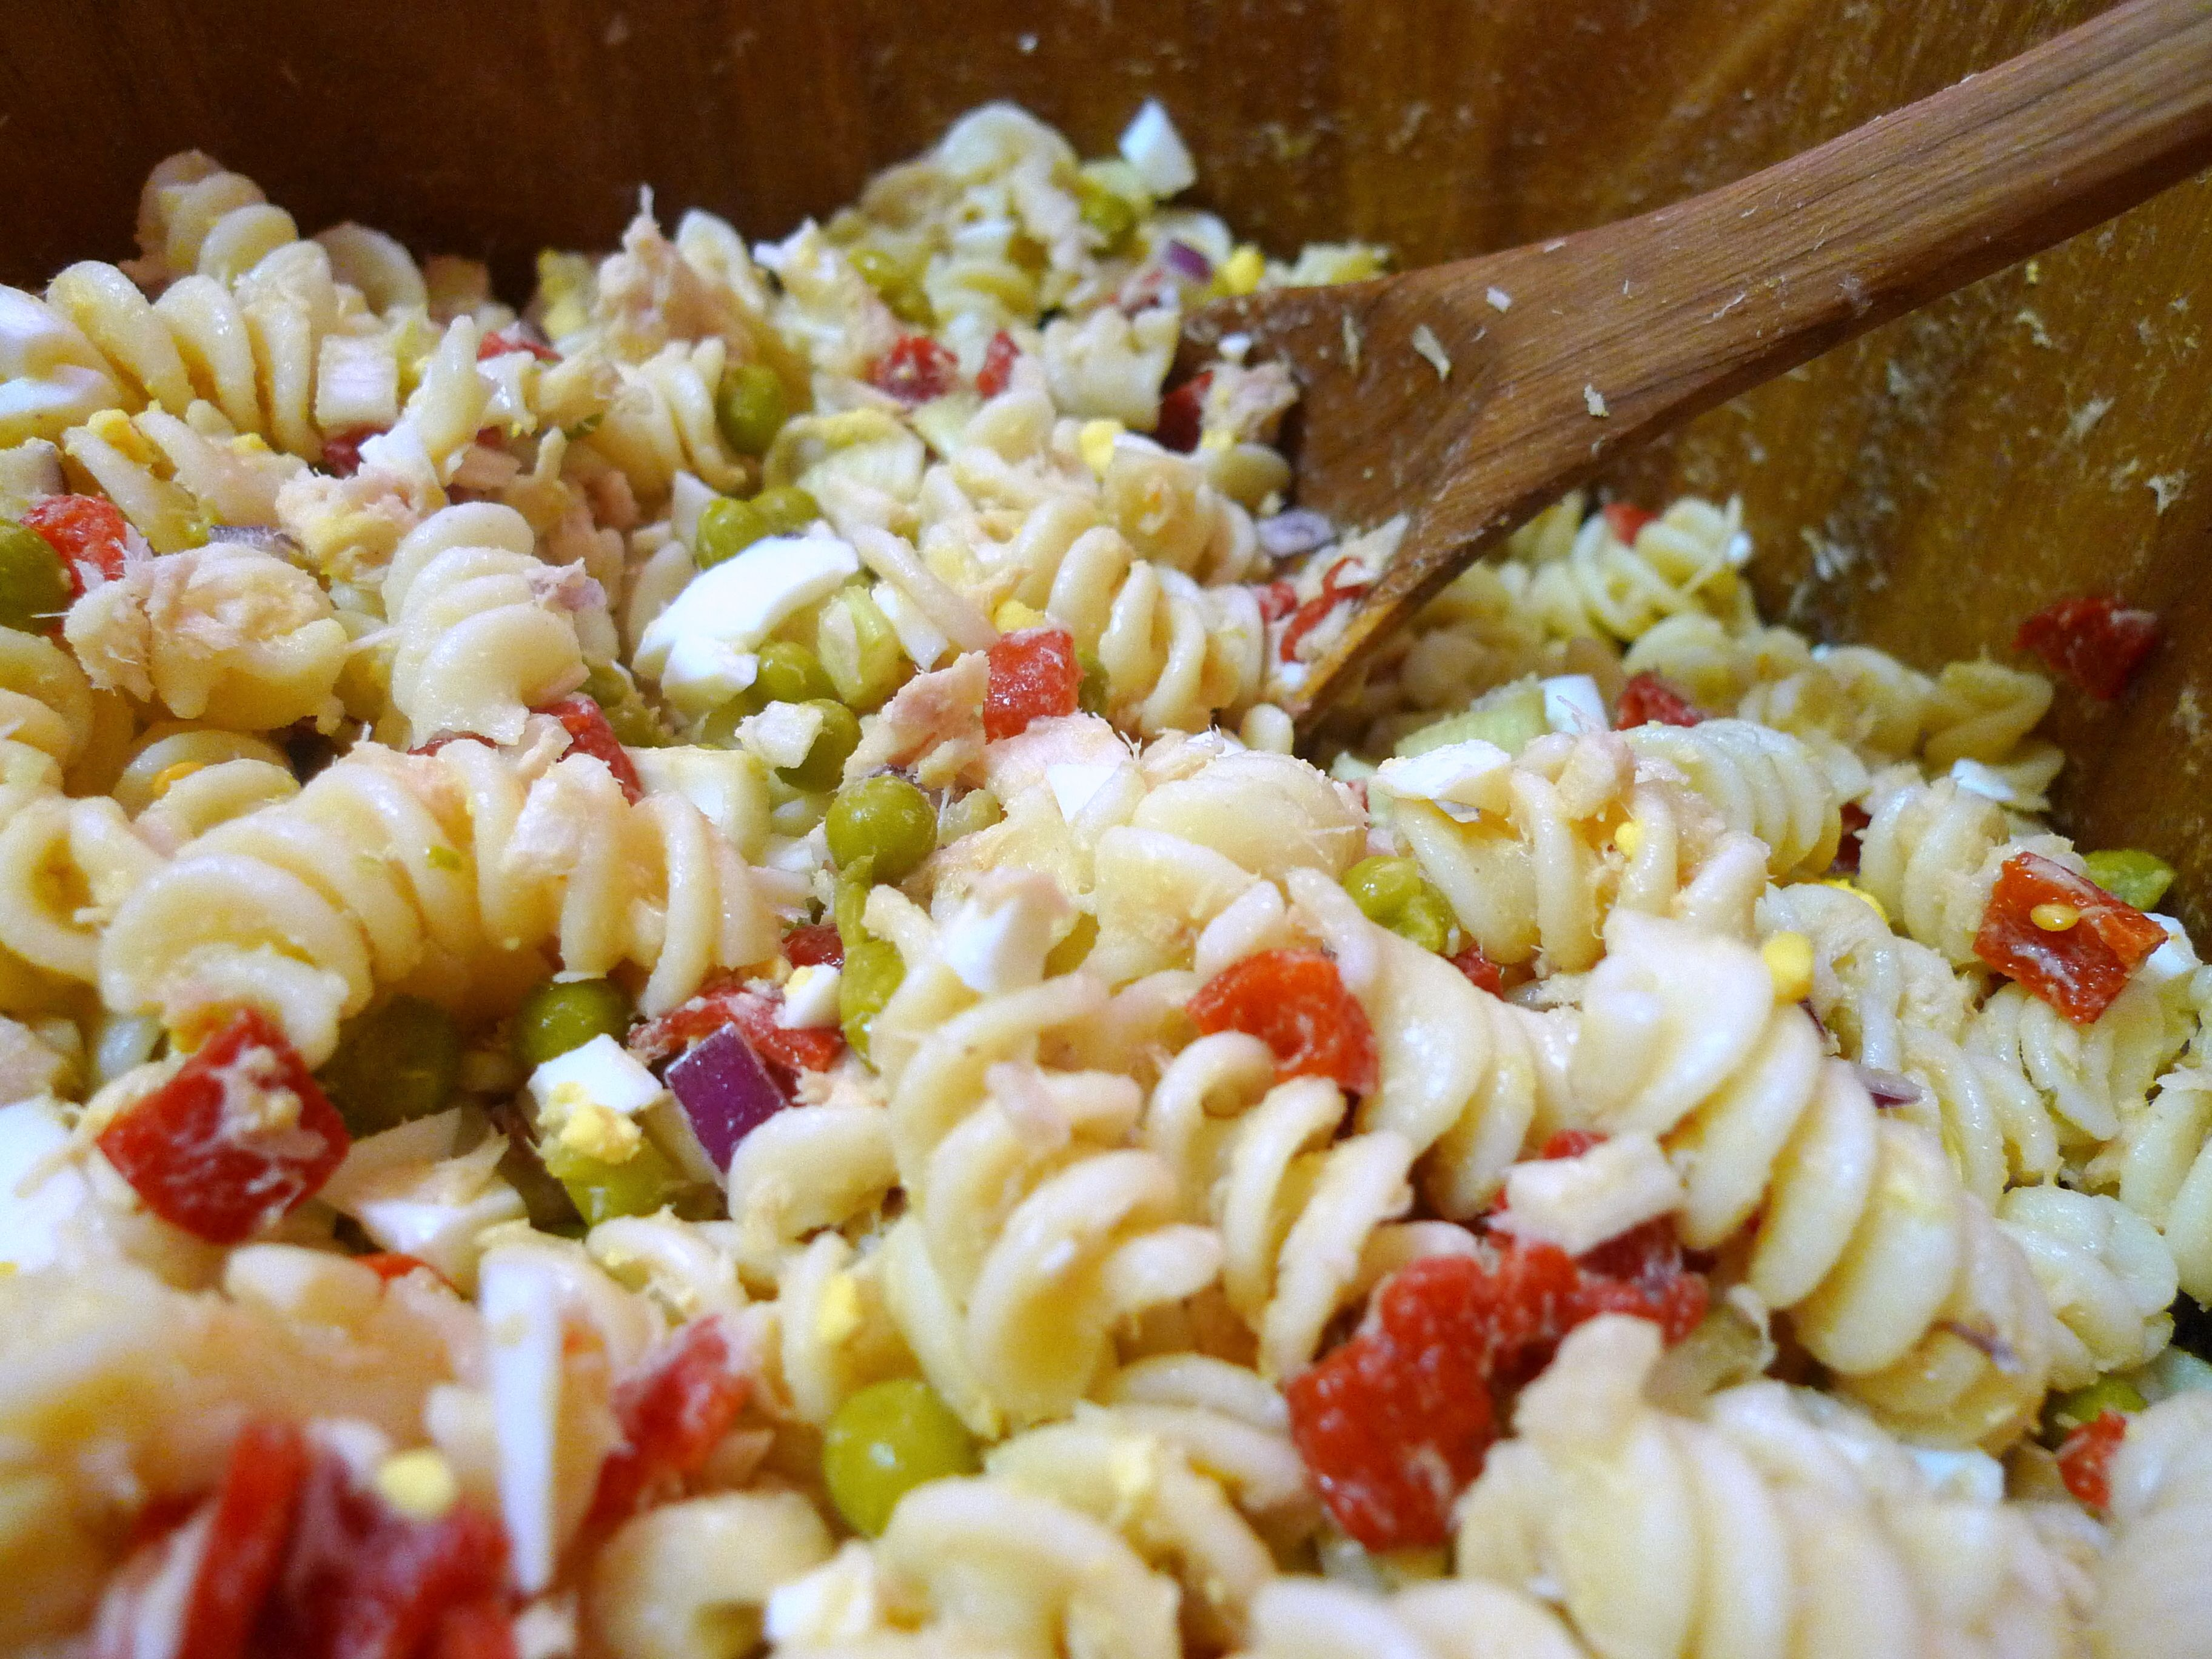 Tuna Pasta Salad--stir in the mayo, dijon mustard, lemon juice, paprika, salt, pepper